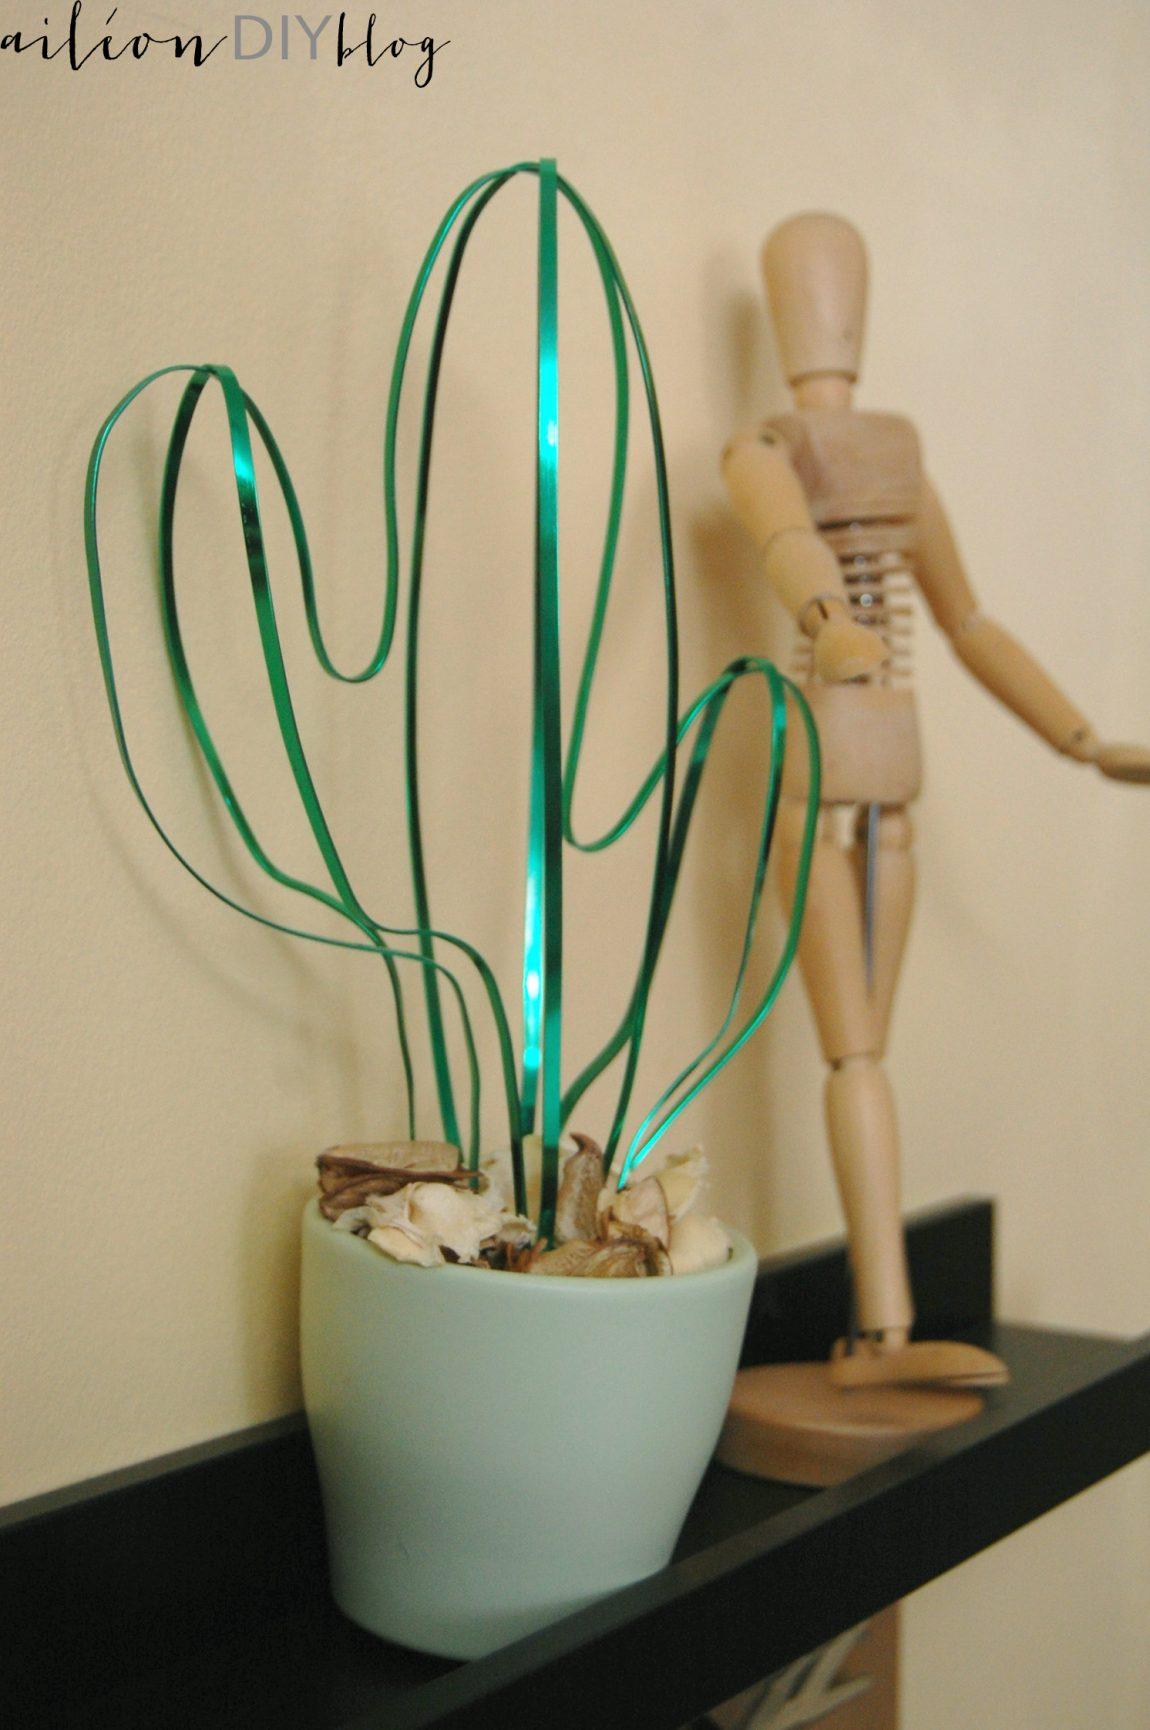 cactus alambre DIY